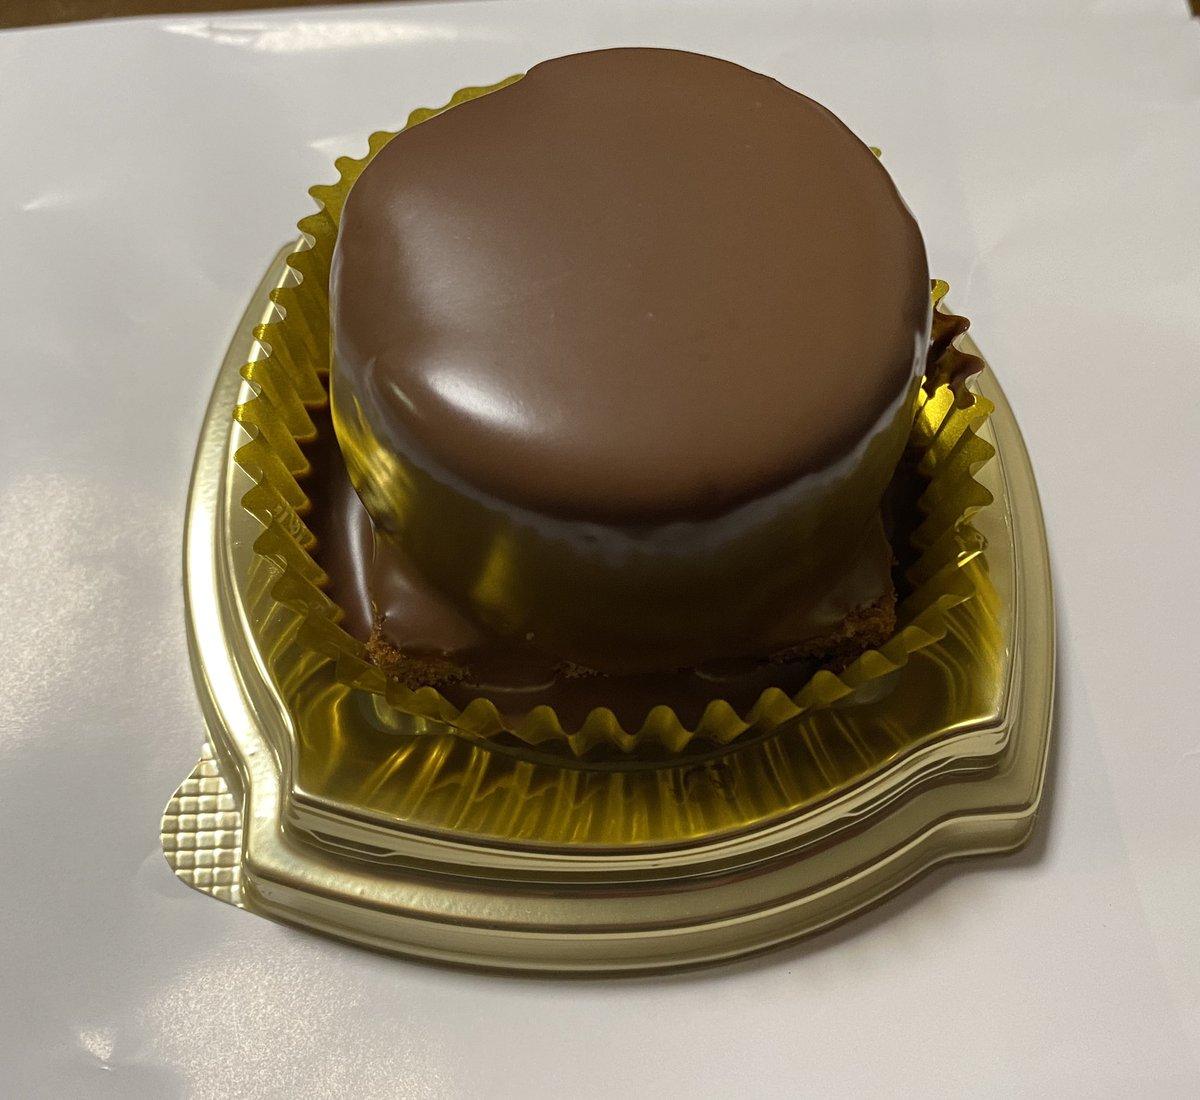 test ツイッターメディア - 甘いものの話  ファミリーマートとケンズカフェ東京とのコラボ「ザッハトルテ」食べました。  ザッハトルテにしてはマイルドで食べやすかったです。 以前、デメルのザッハトルテを食べた時は、濃厚でワンピースでも結構胃にきました。  #ザッハトルテ https://t.co/lWtCWg0XoN